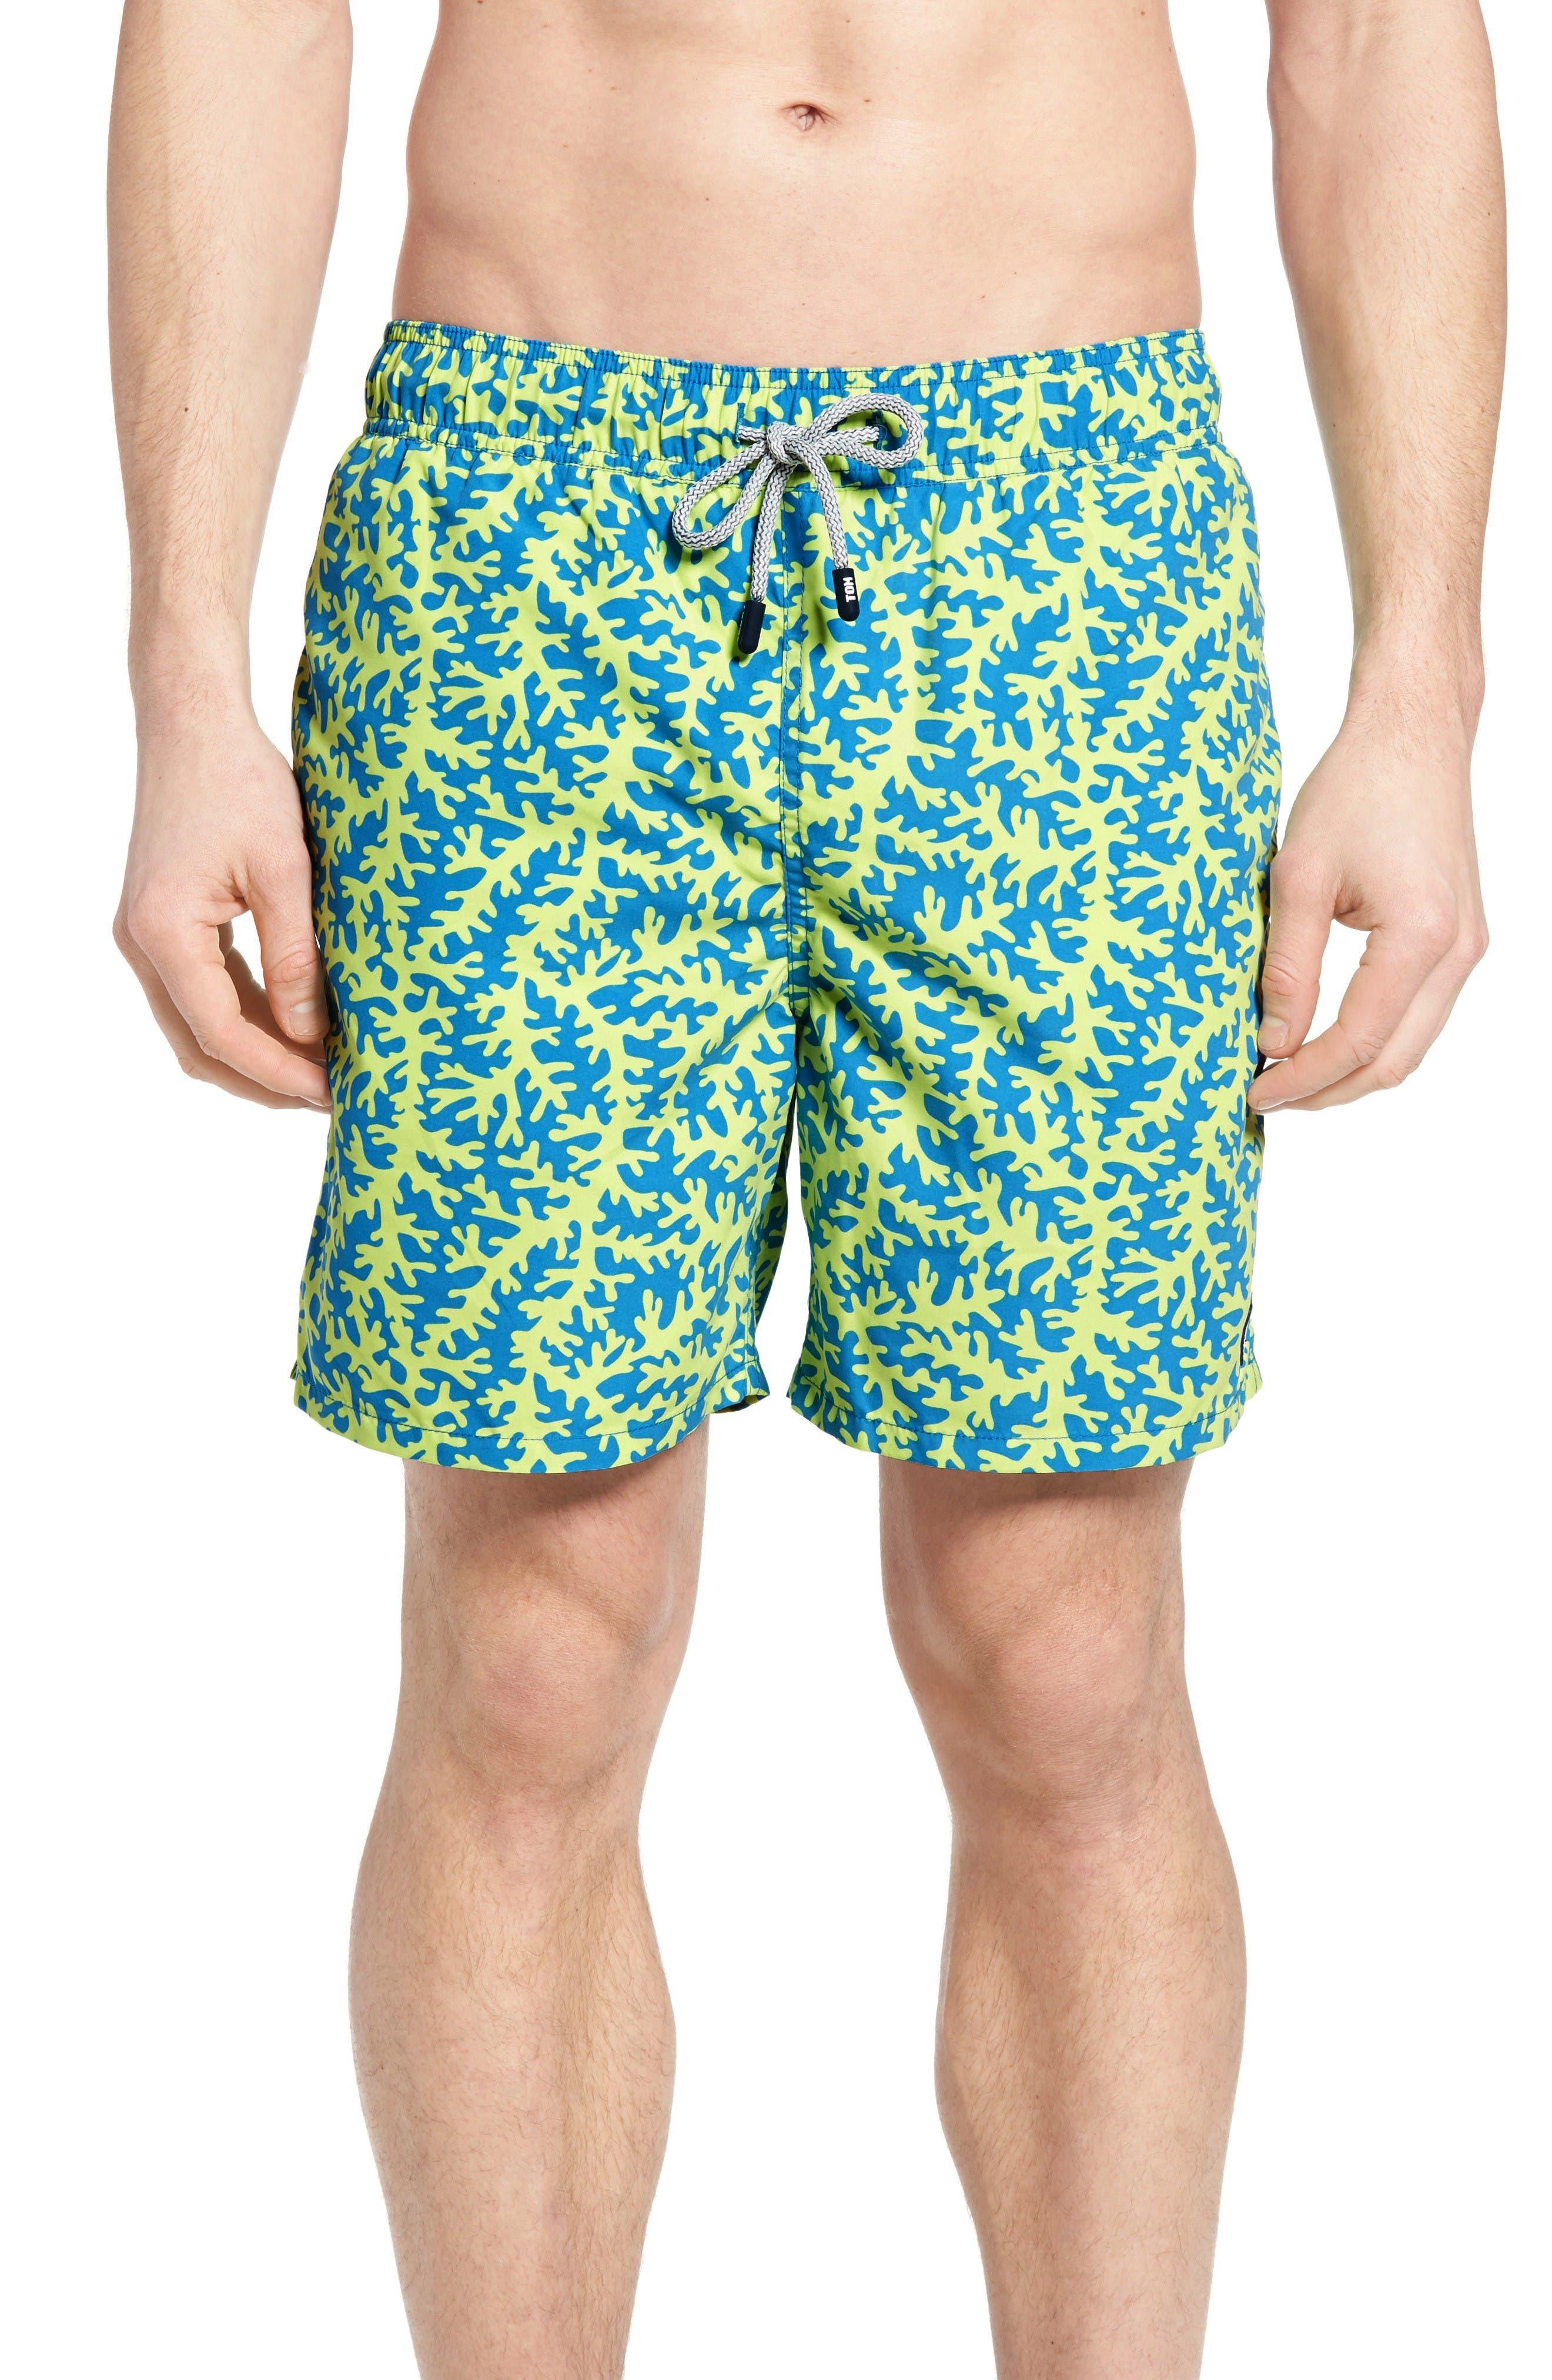 TOM & TEDDY Coral Print Swim Trunks